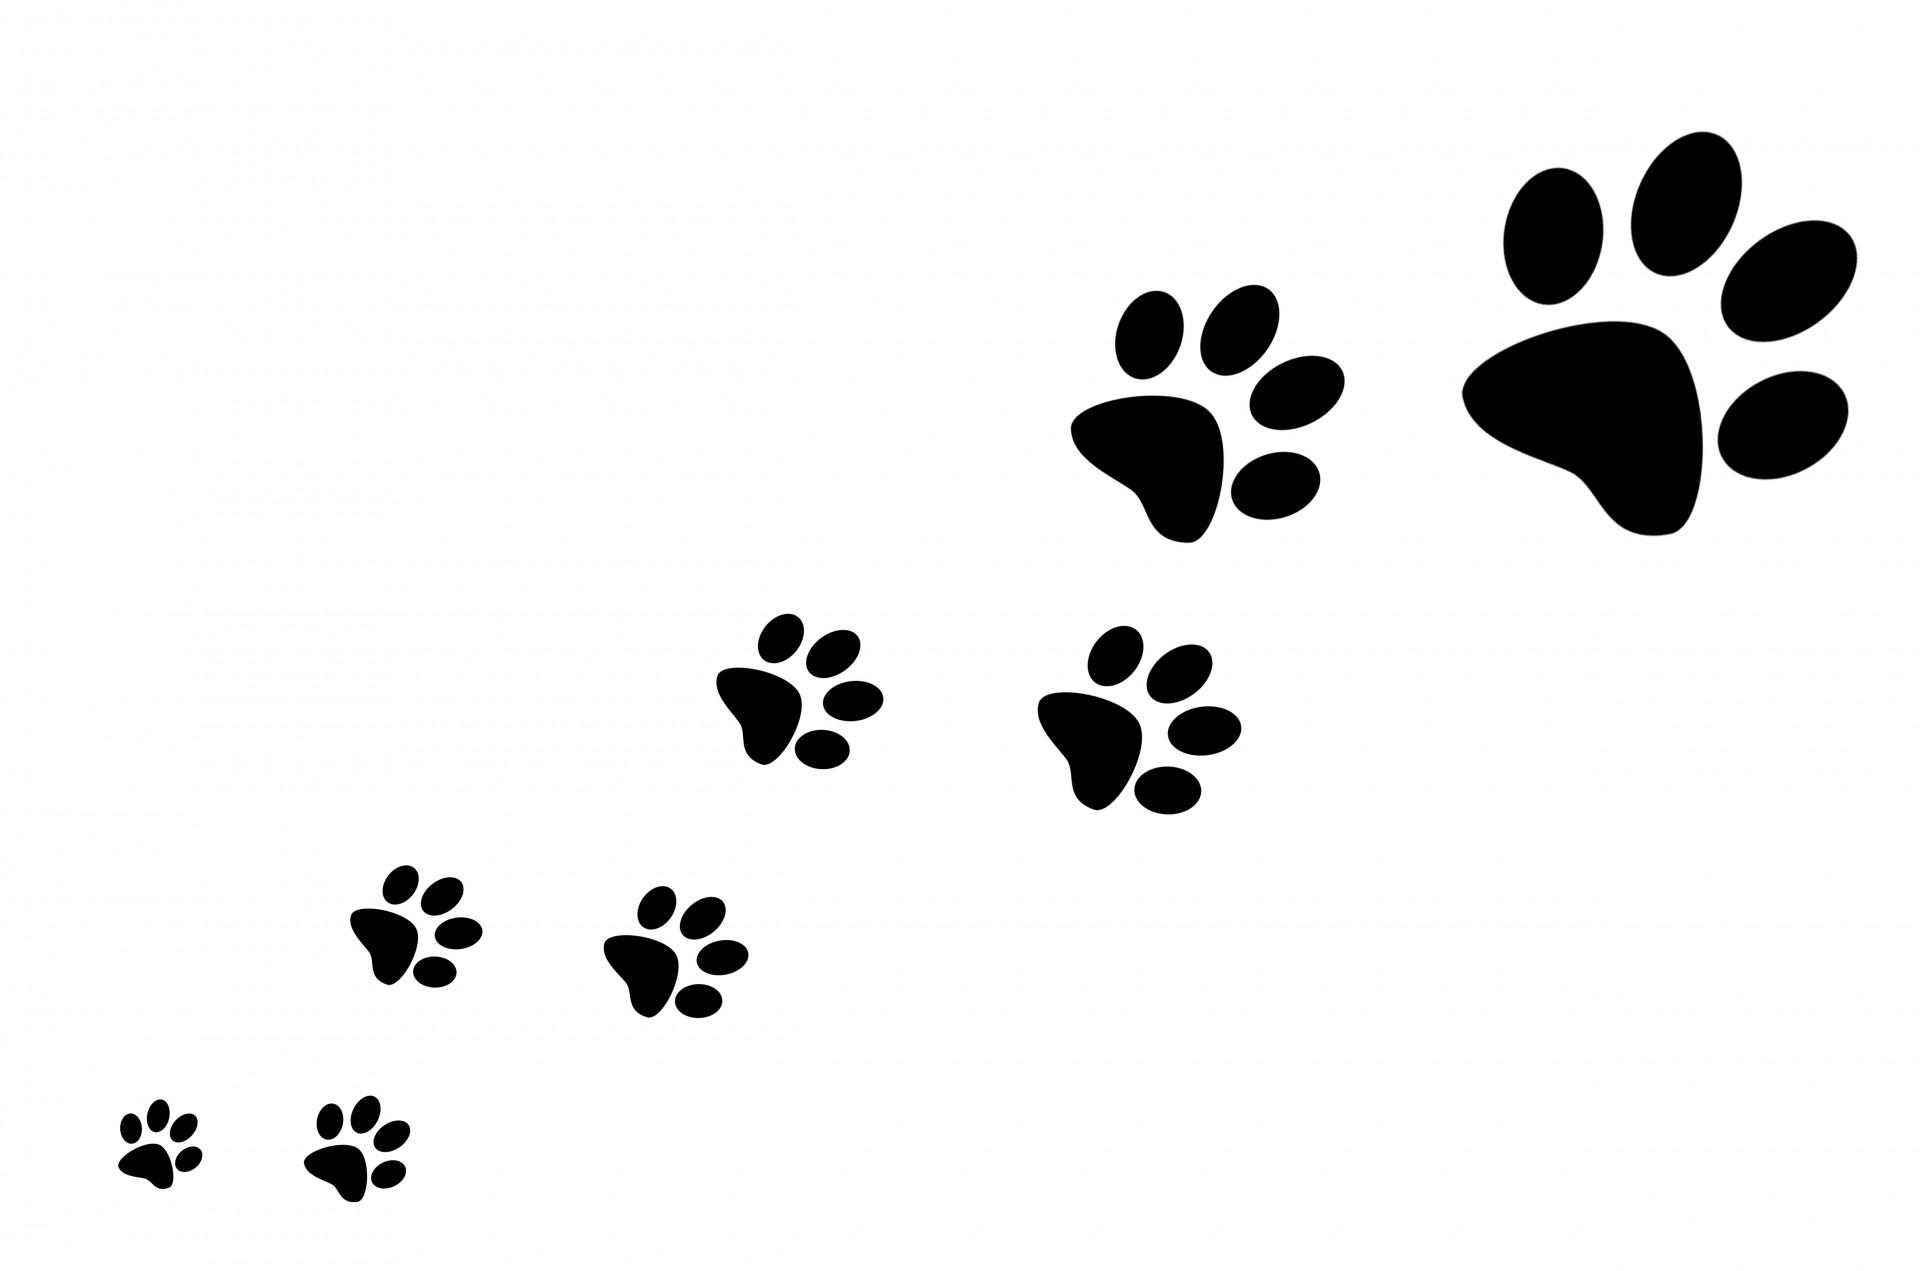 Dog paw prints backgrounds